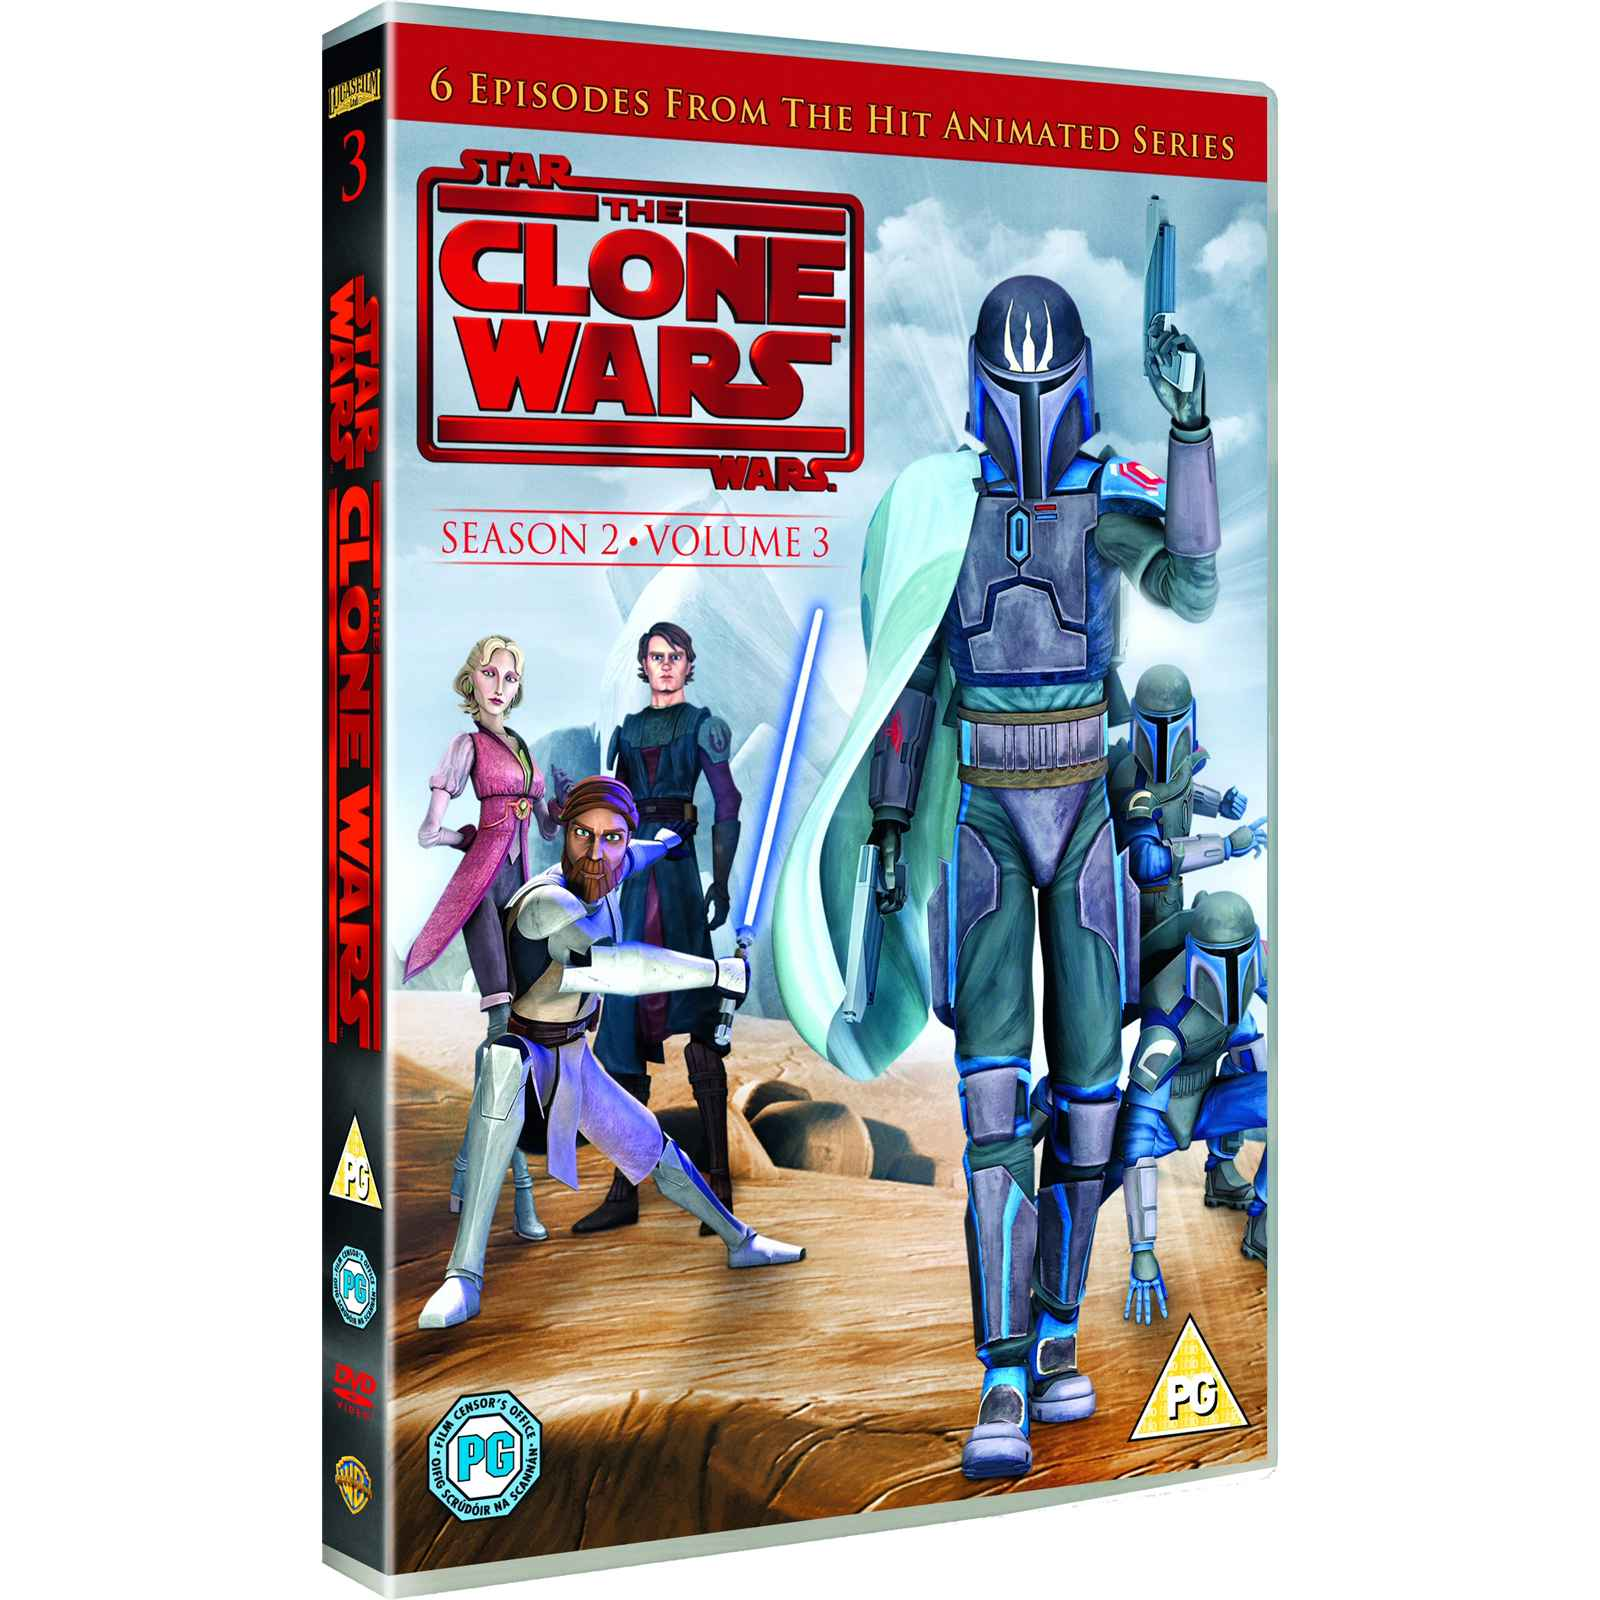 star wars the clone wars full movie 123movies